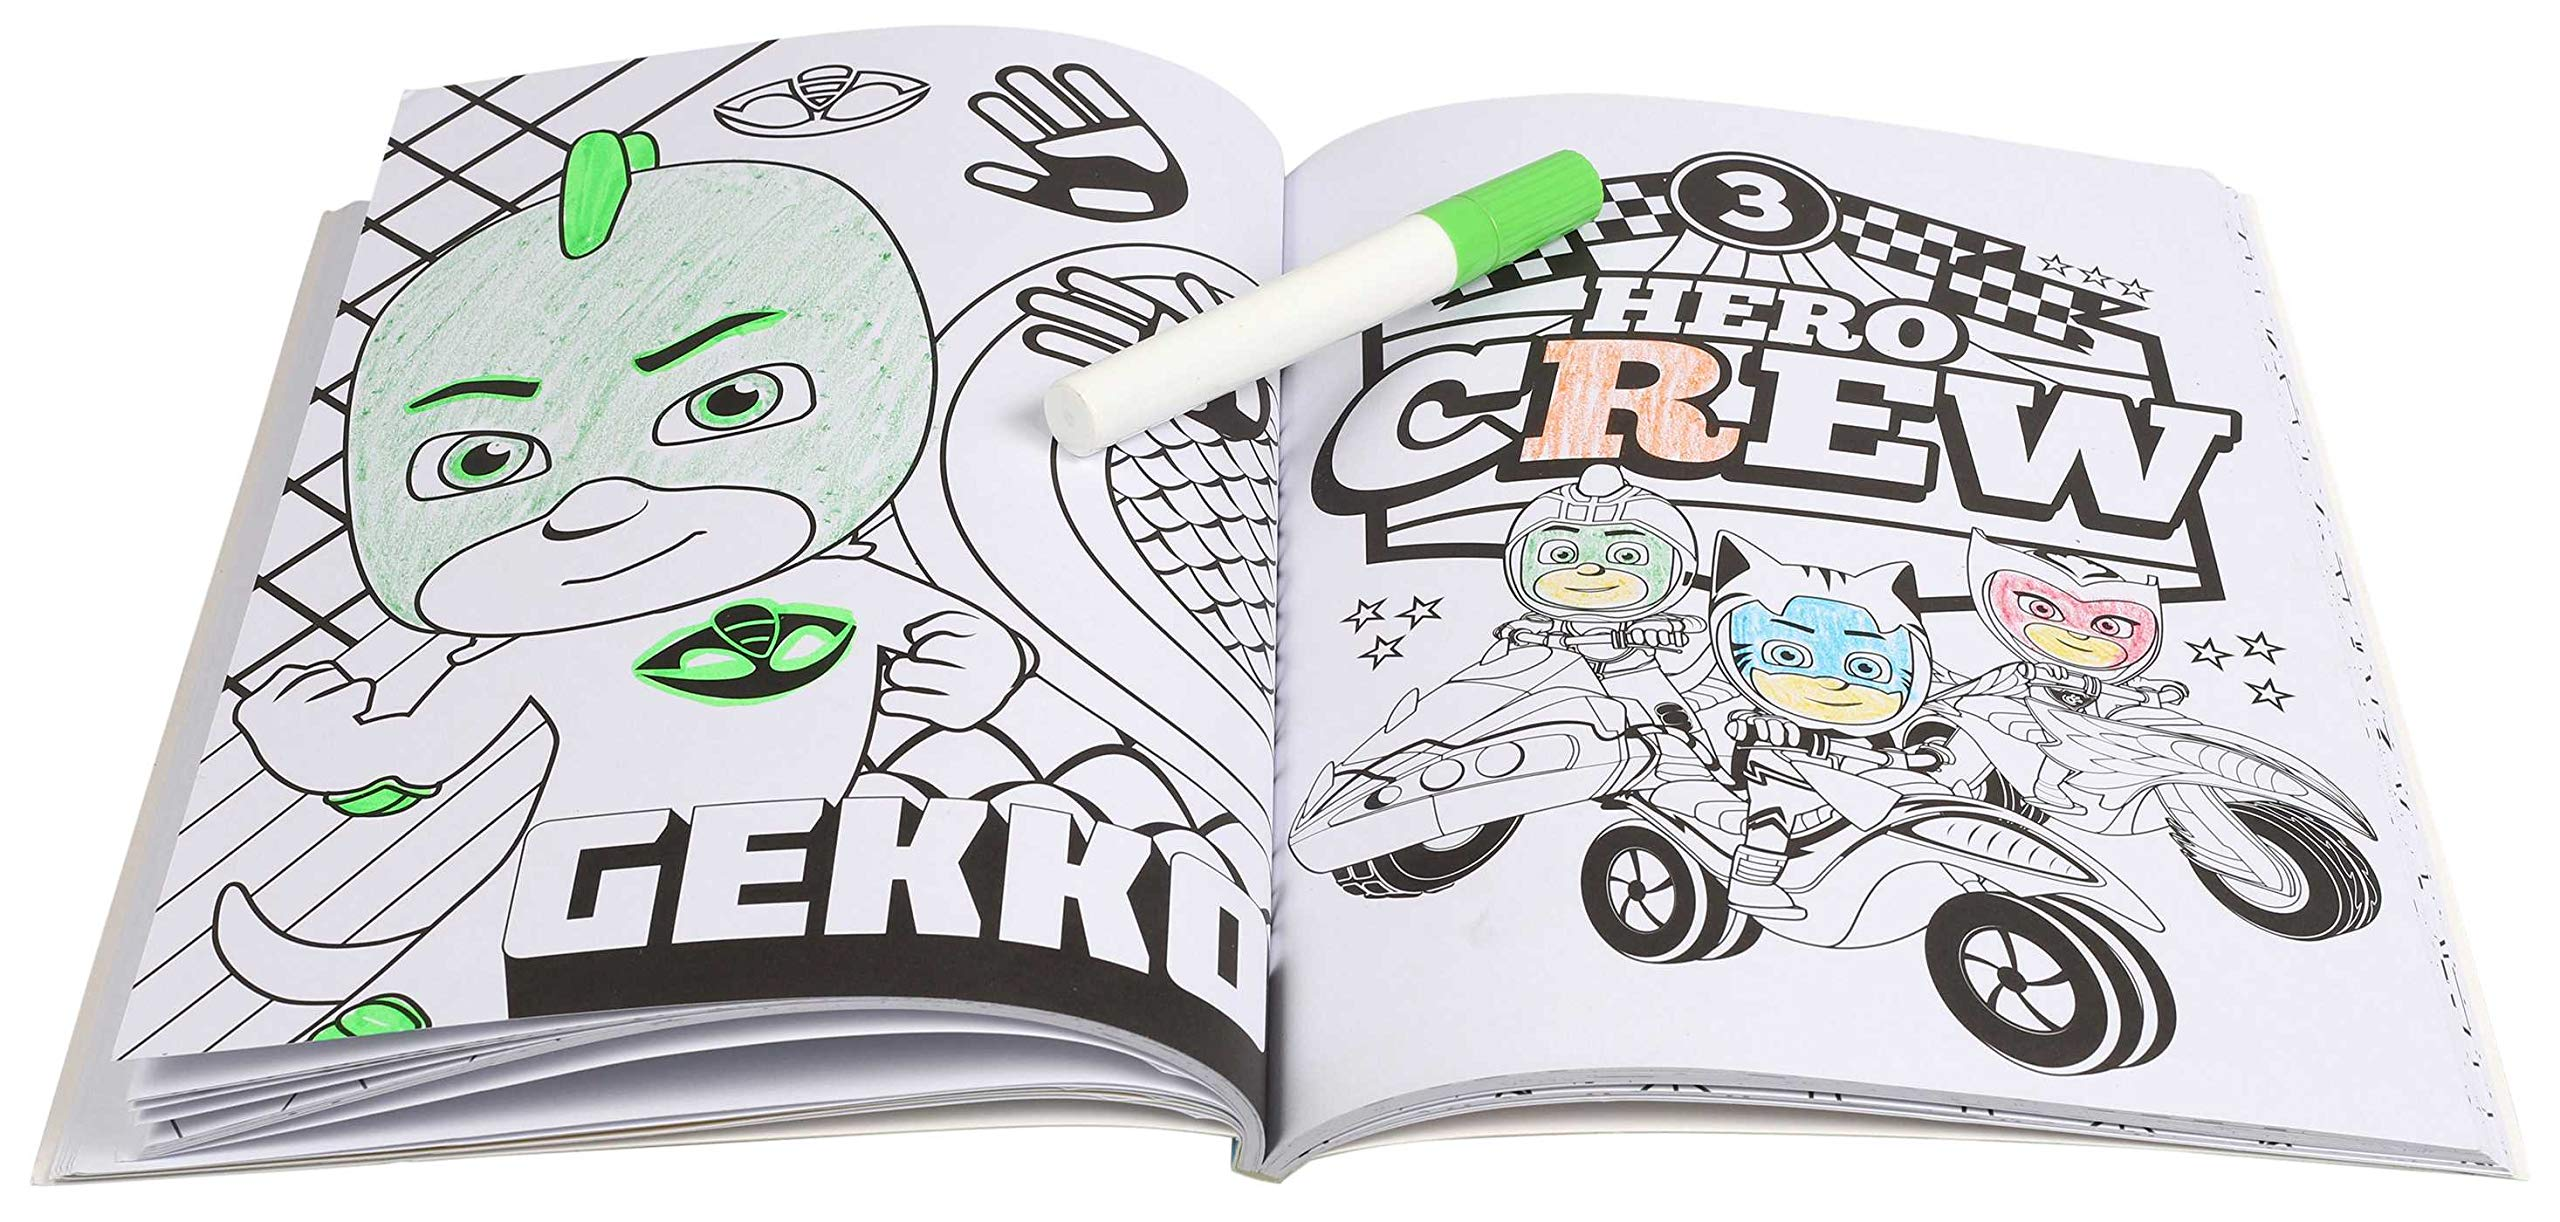 Pj Masks: Heroes Stick Together: Amazon.es: Editors of Studio ...